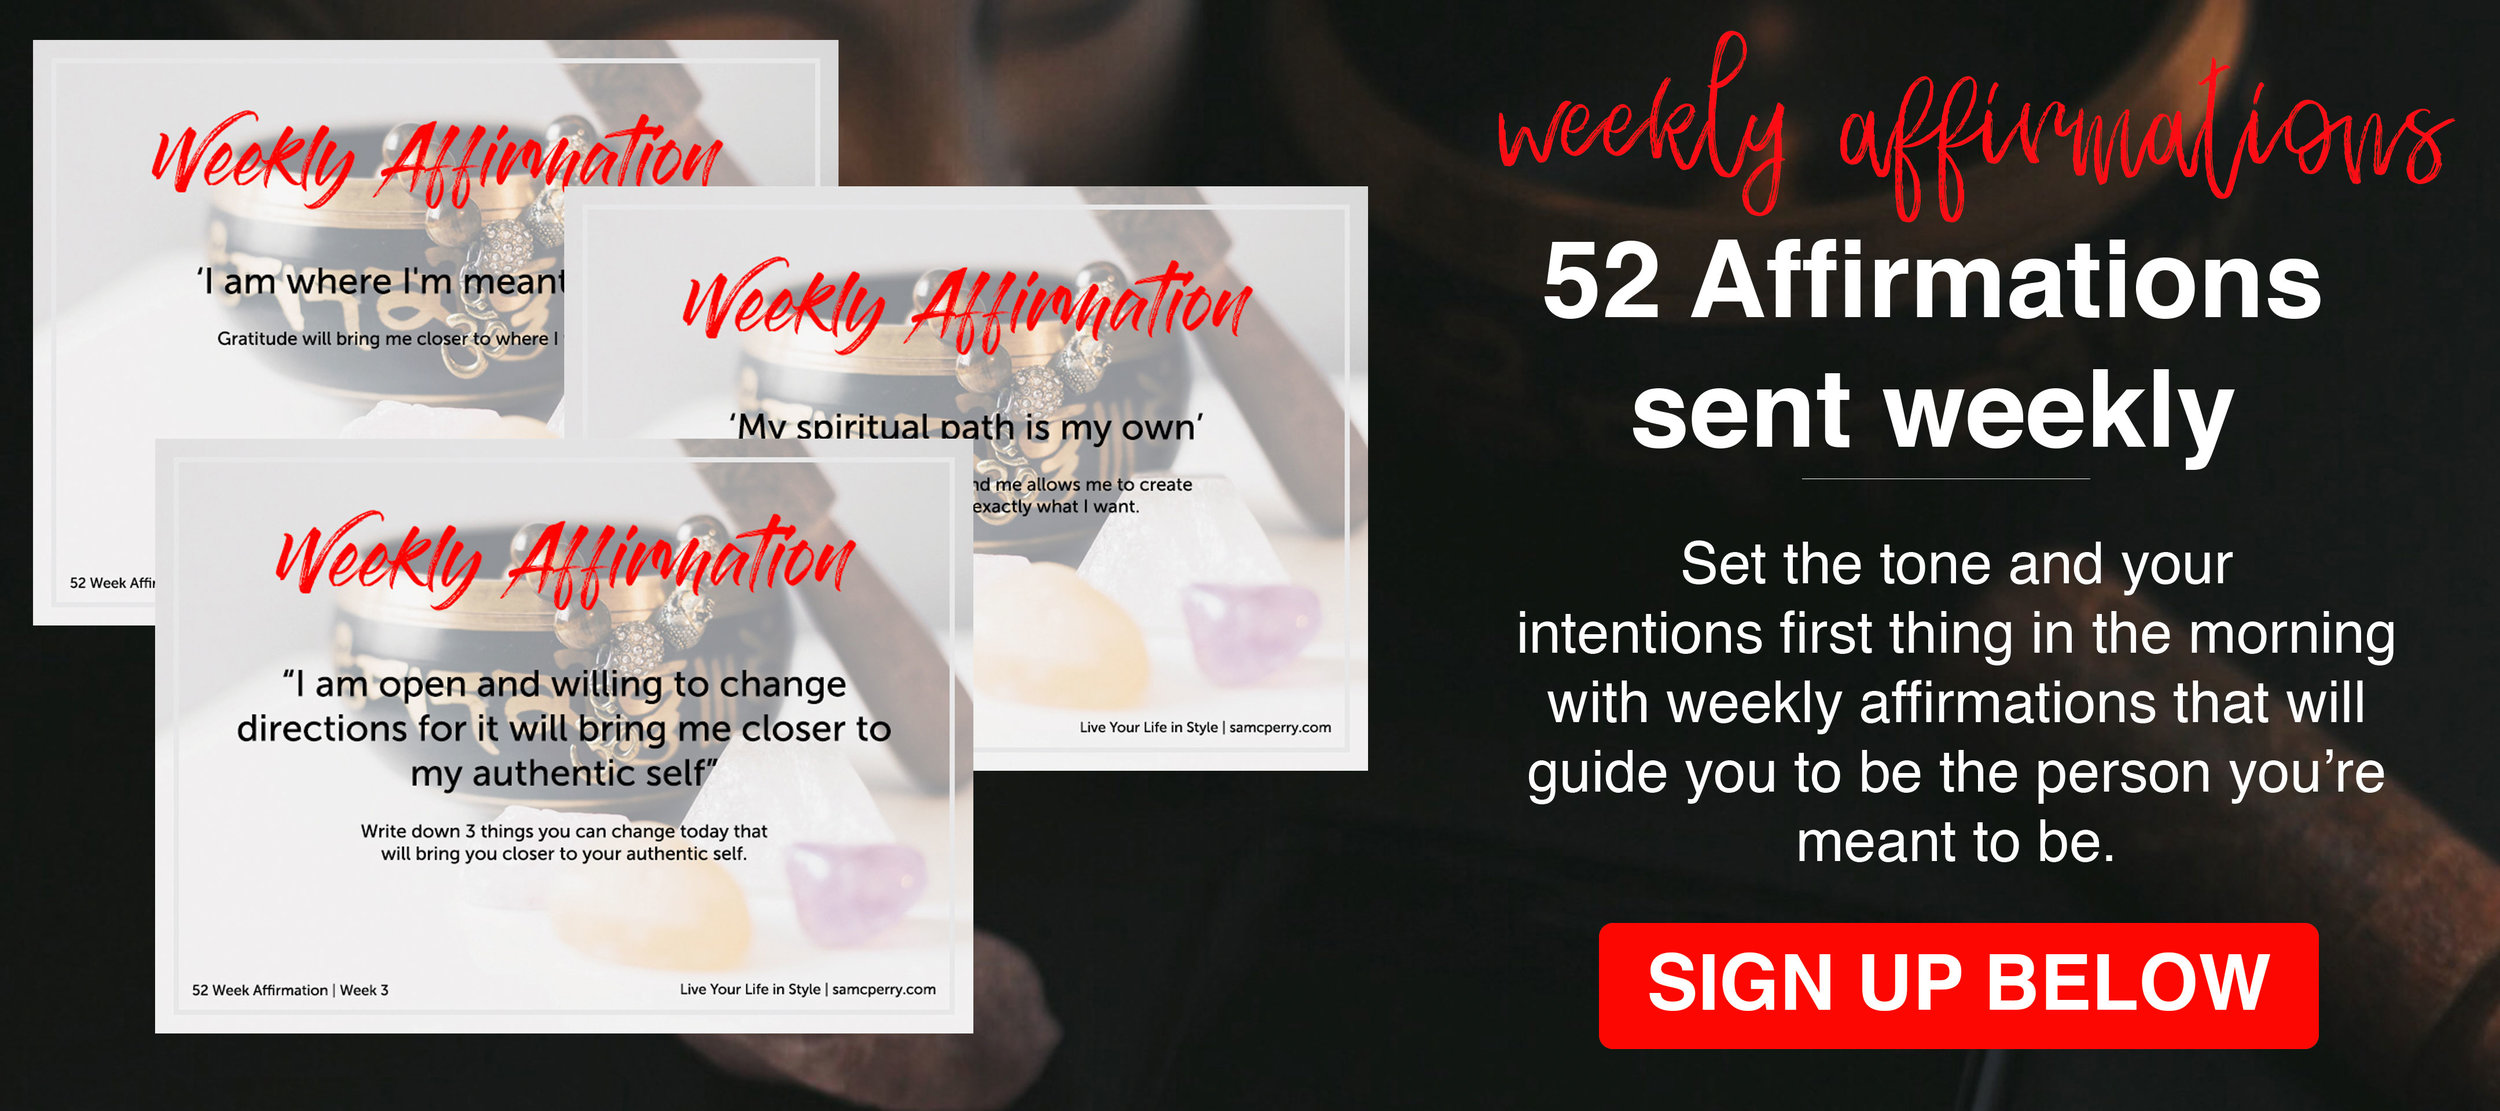 weekly-affirmations-promo.jpg